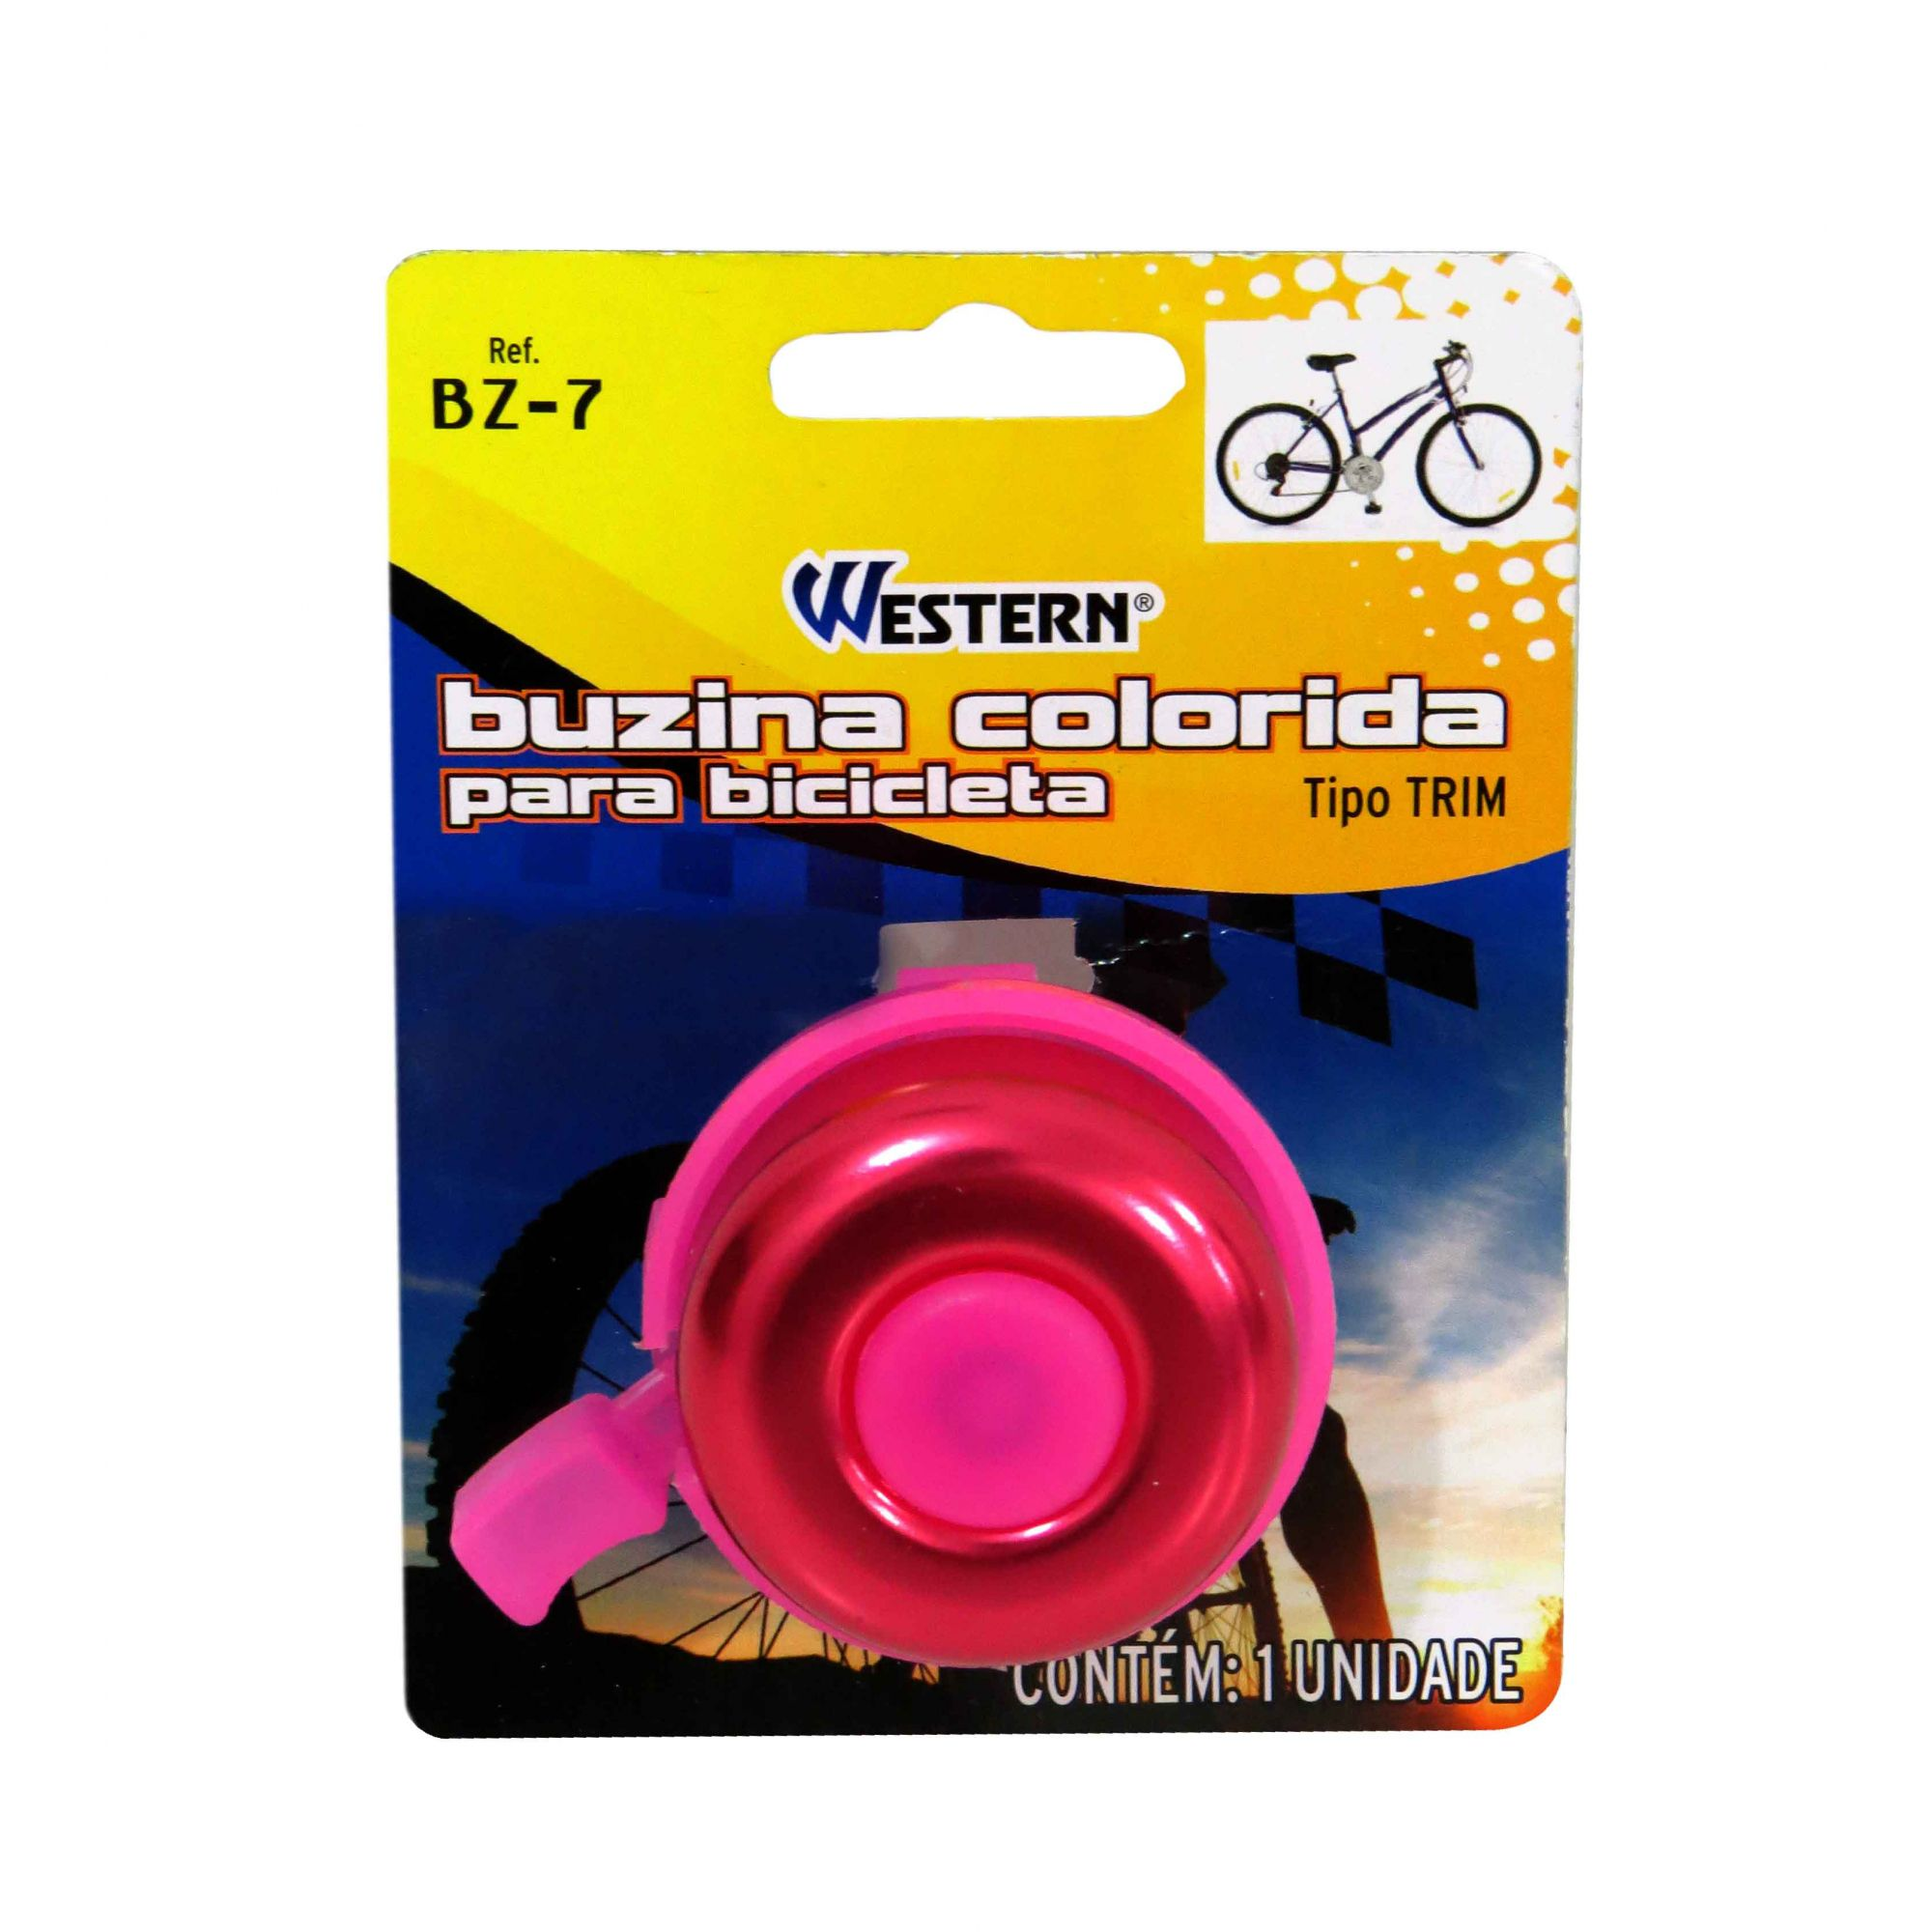 Buzina Colorida Para Bicicleta Bike Tipo Trim Western